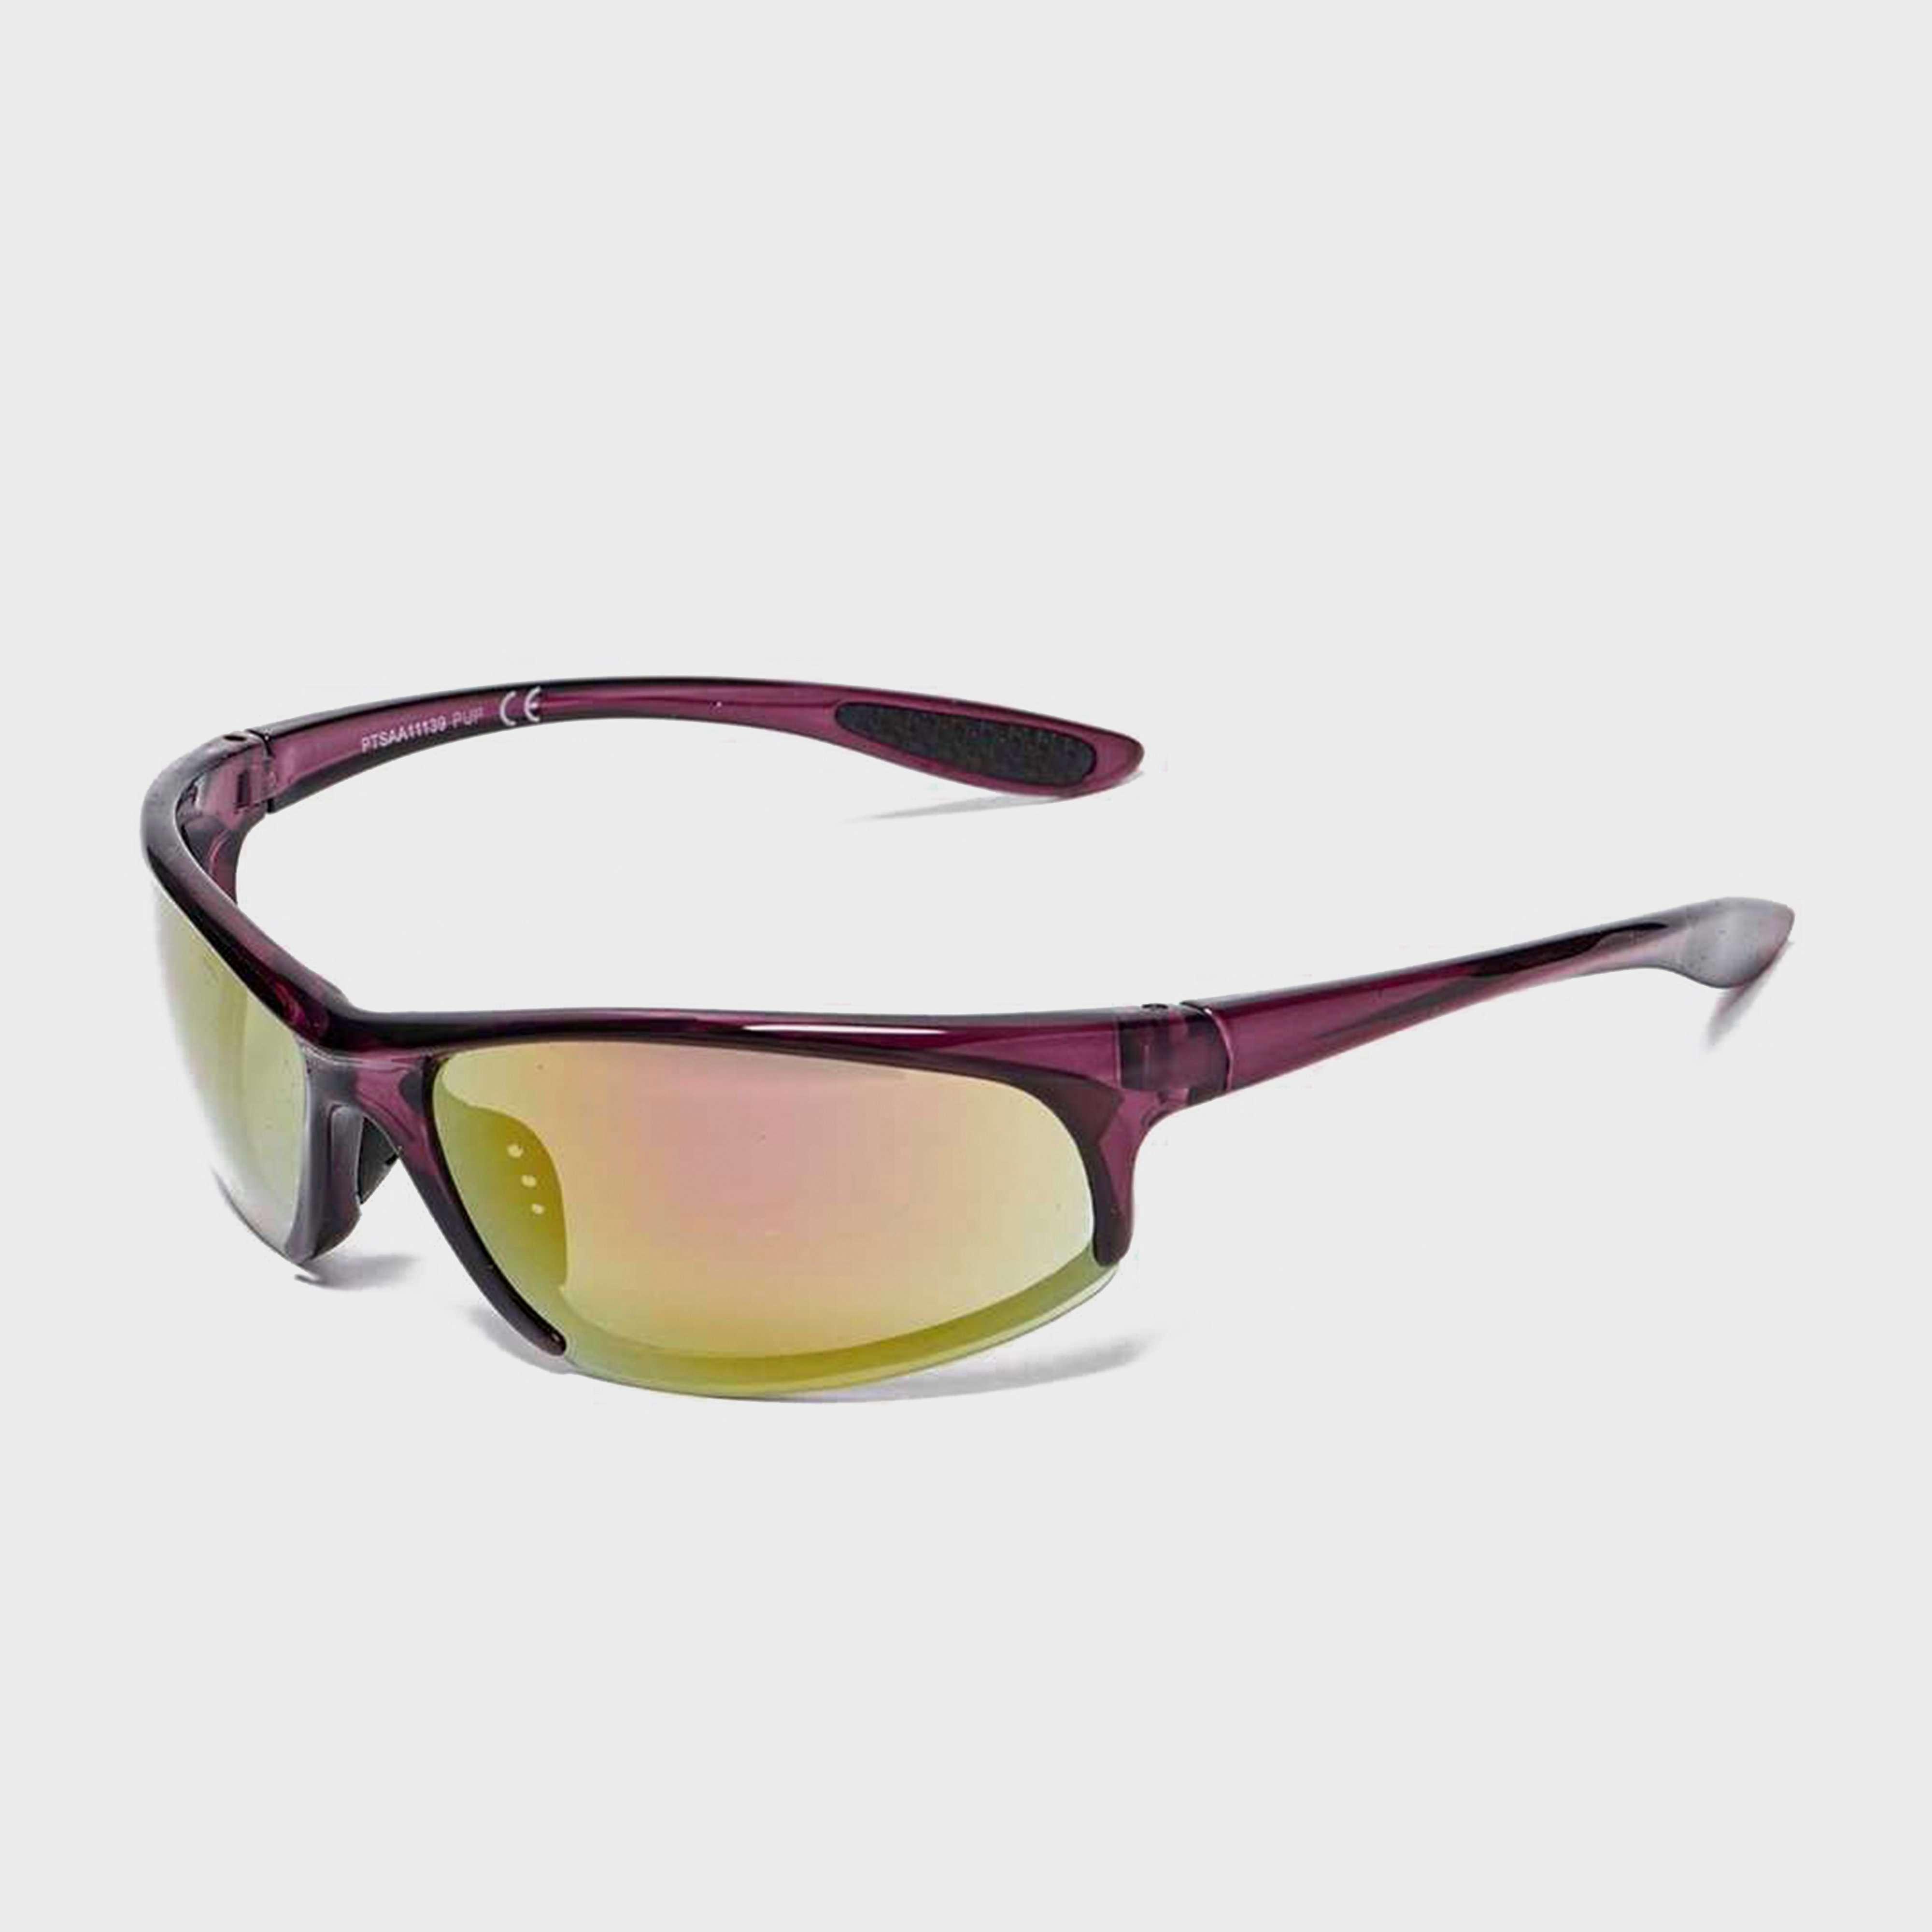 PETER STORM Women's Crystal Sunglasses